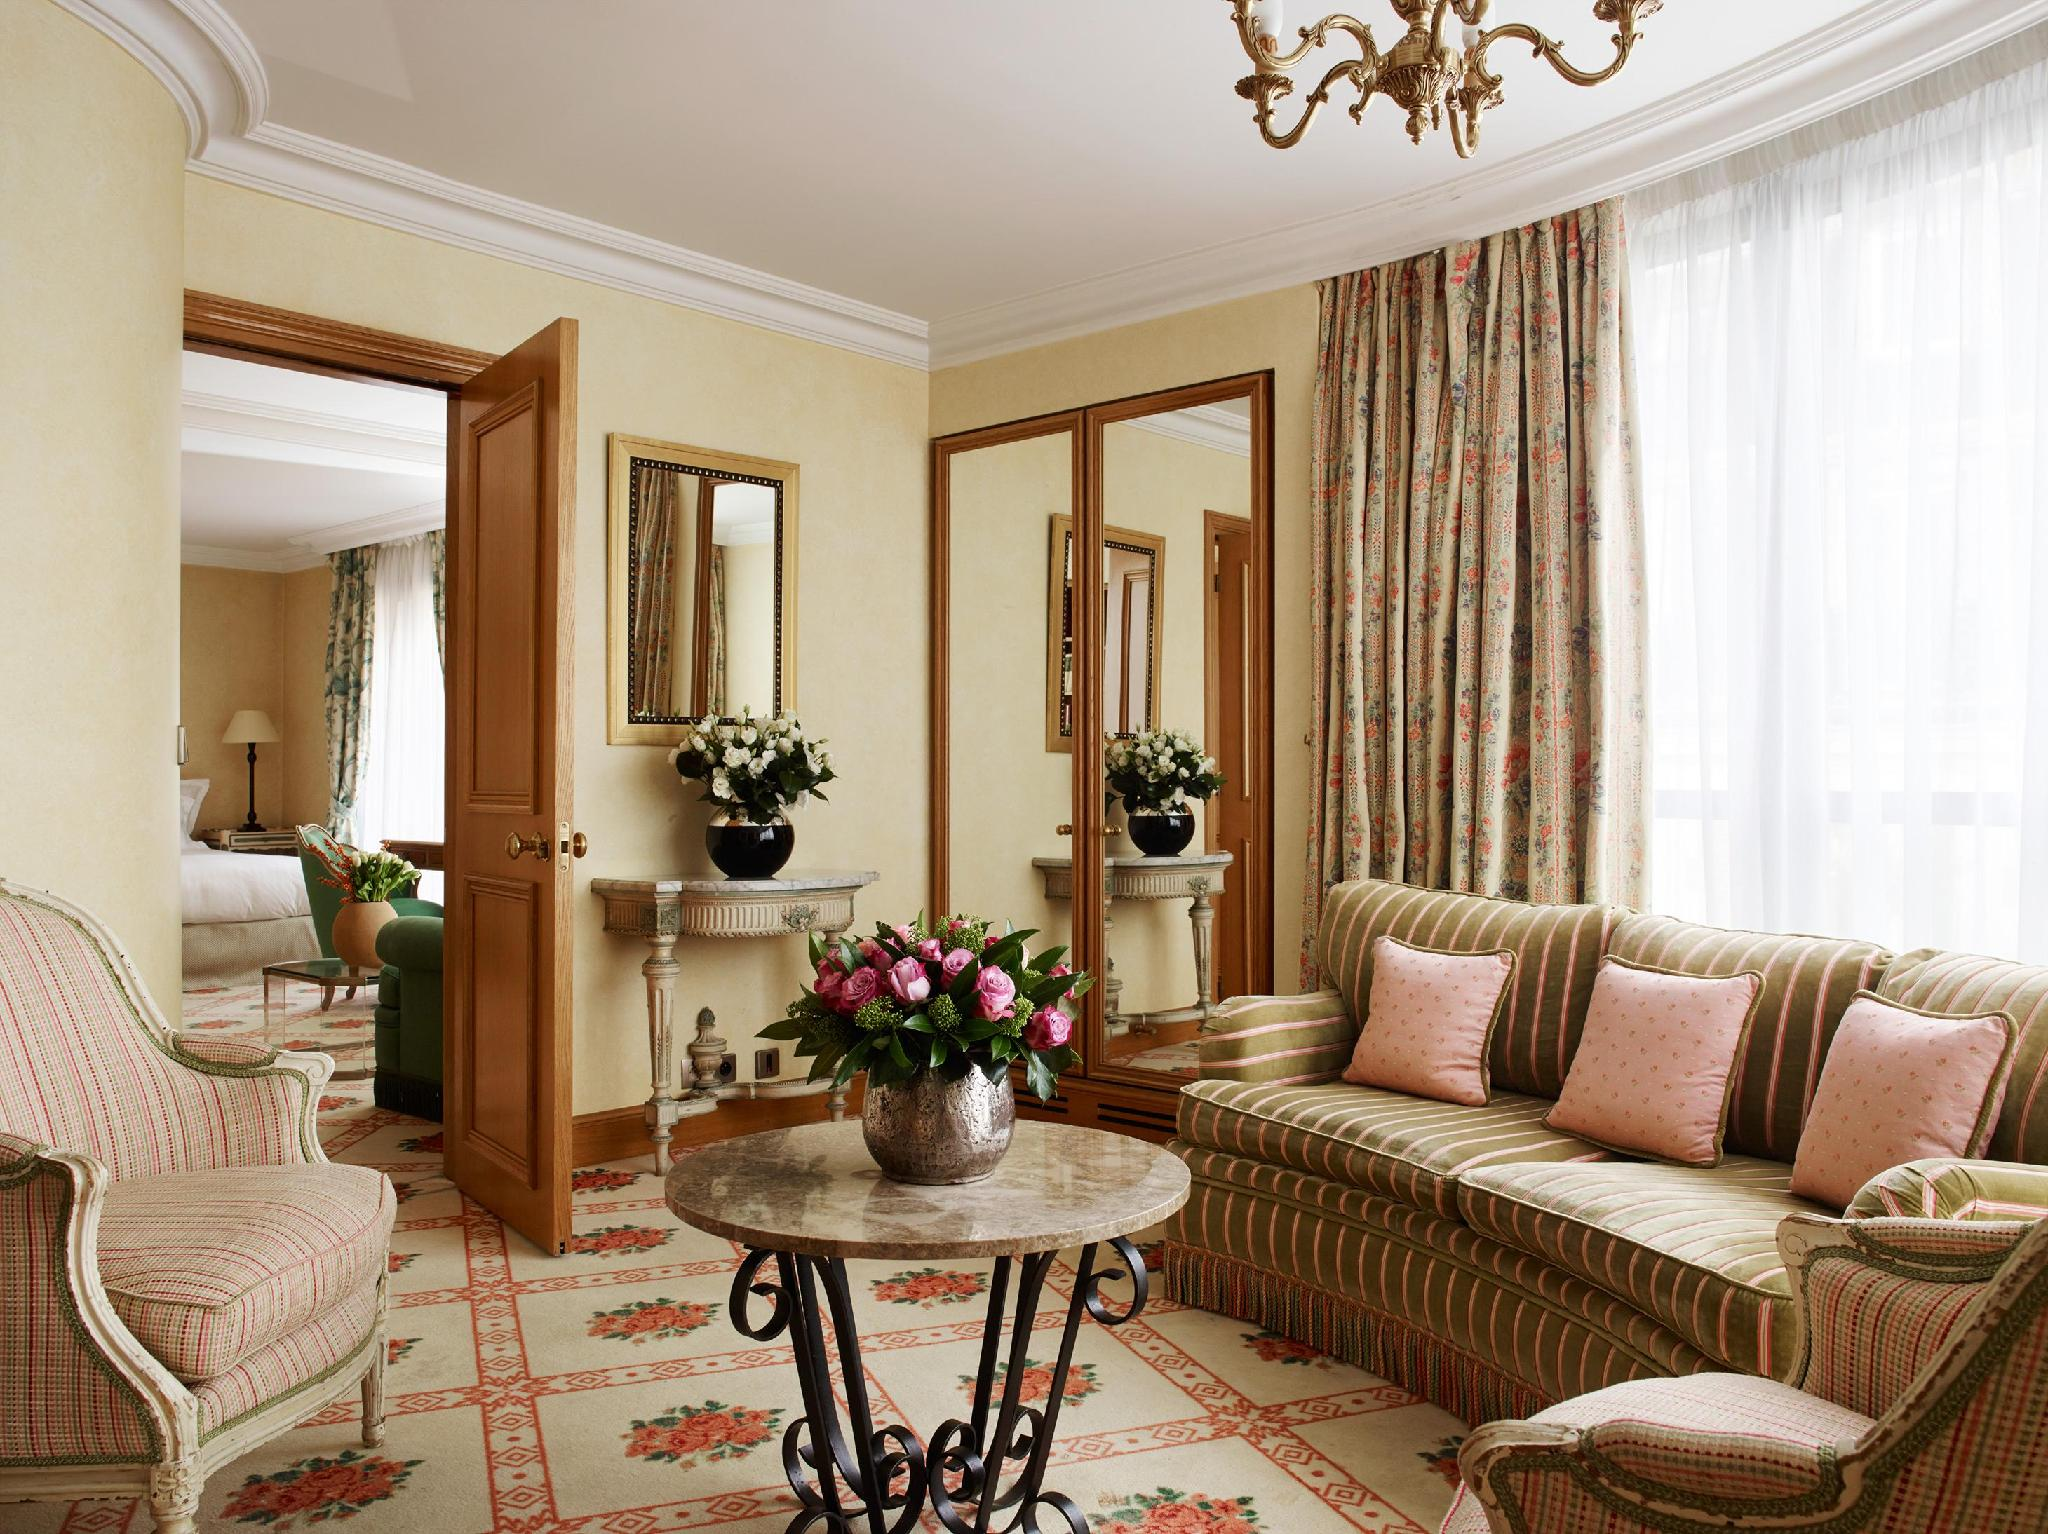 Hotel de Vigny Champs Elysees Paris